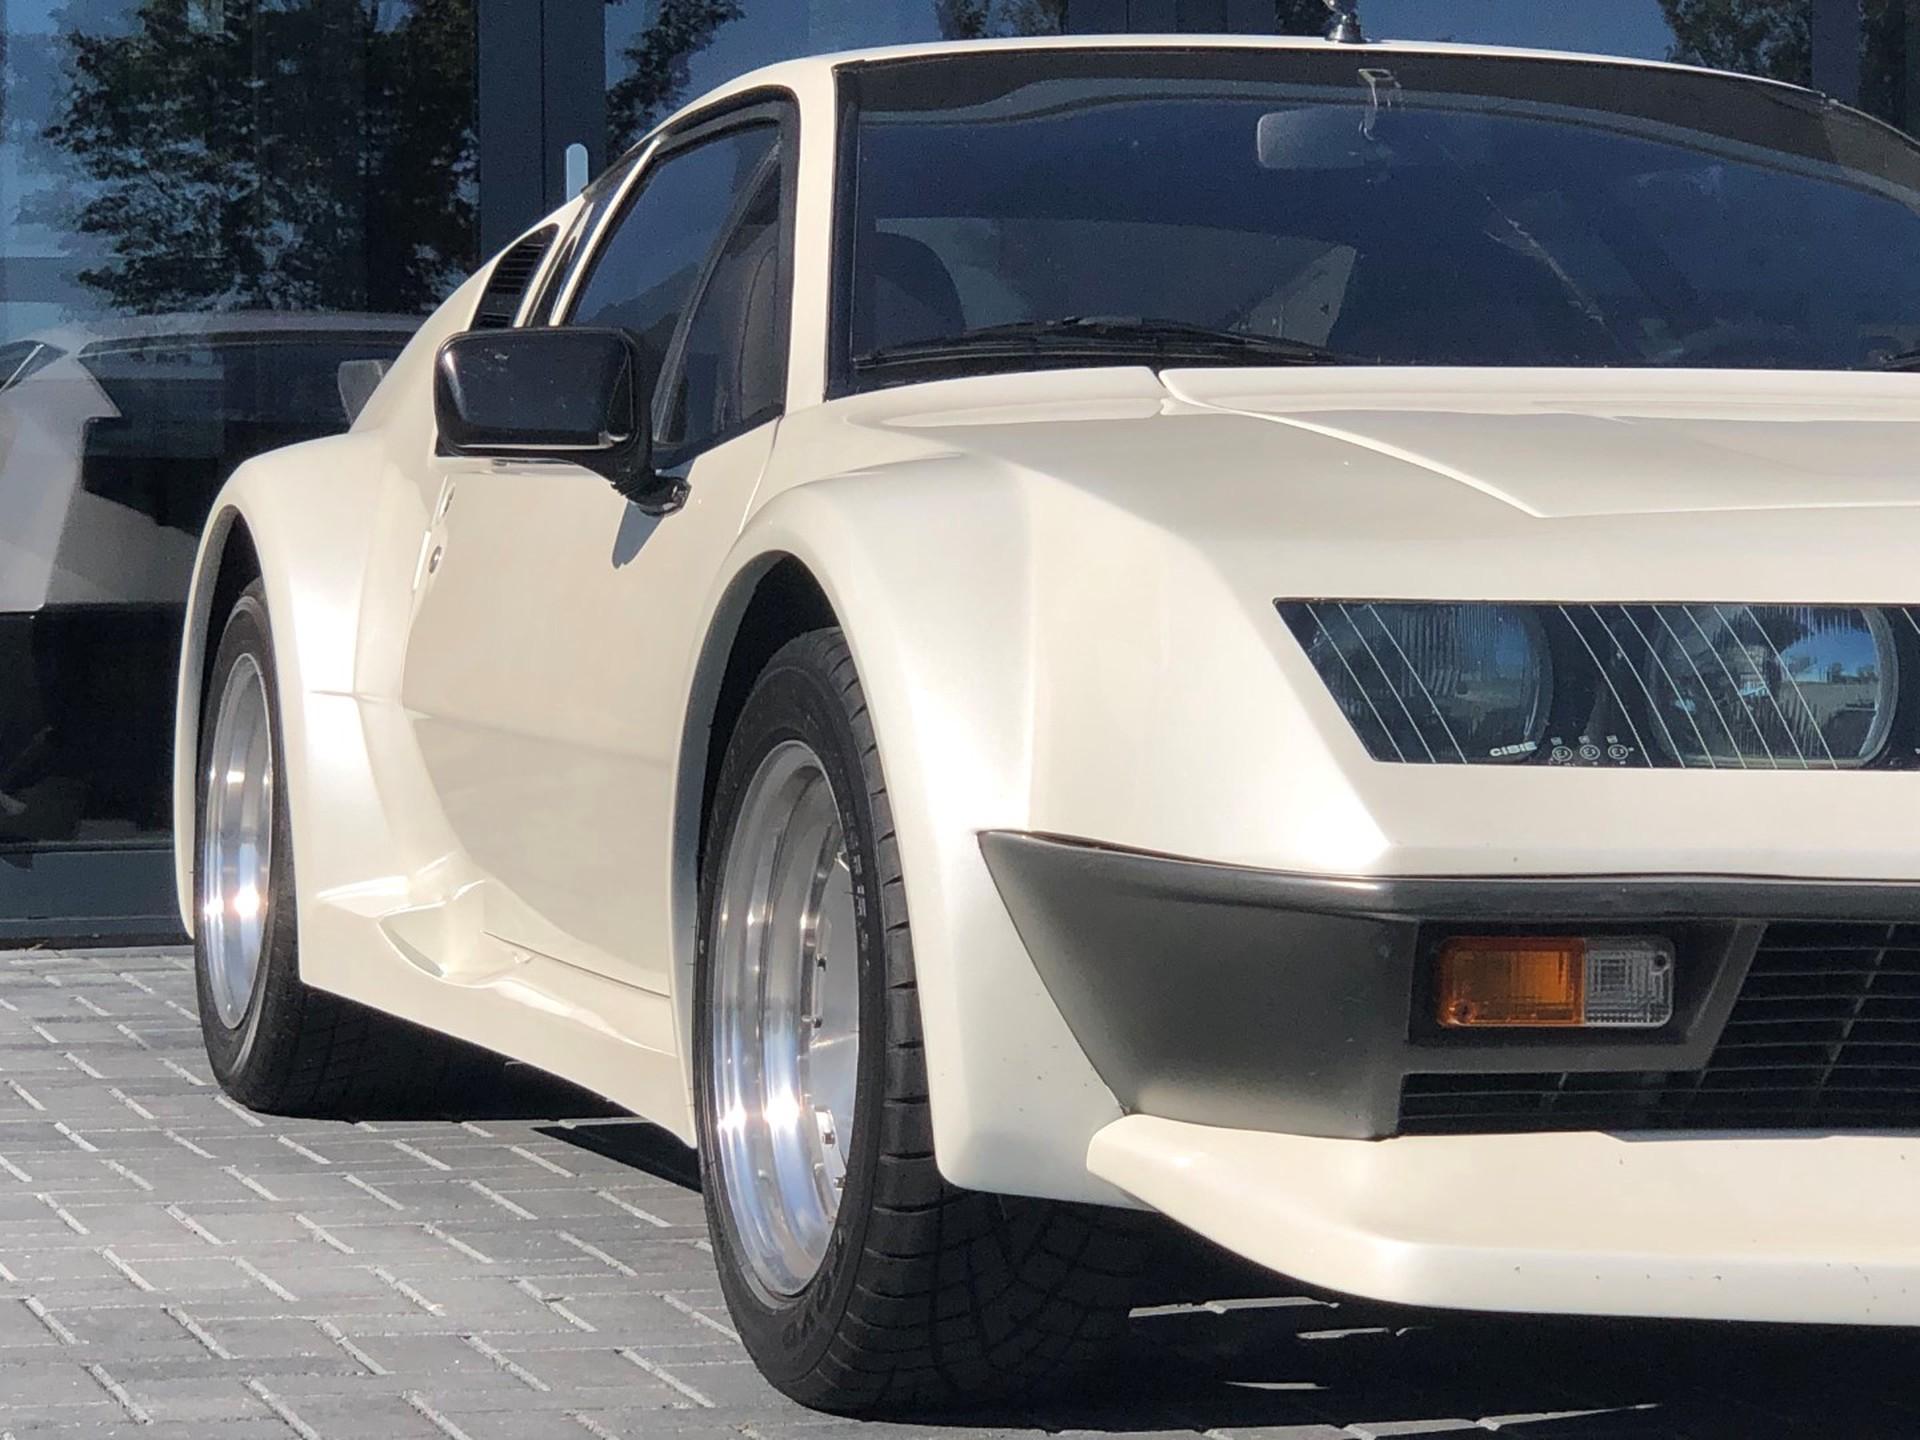 Renault-Alpine originele Pack GT (S)-2.7 V6 A 310-Auto Jonkman Berlikum